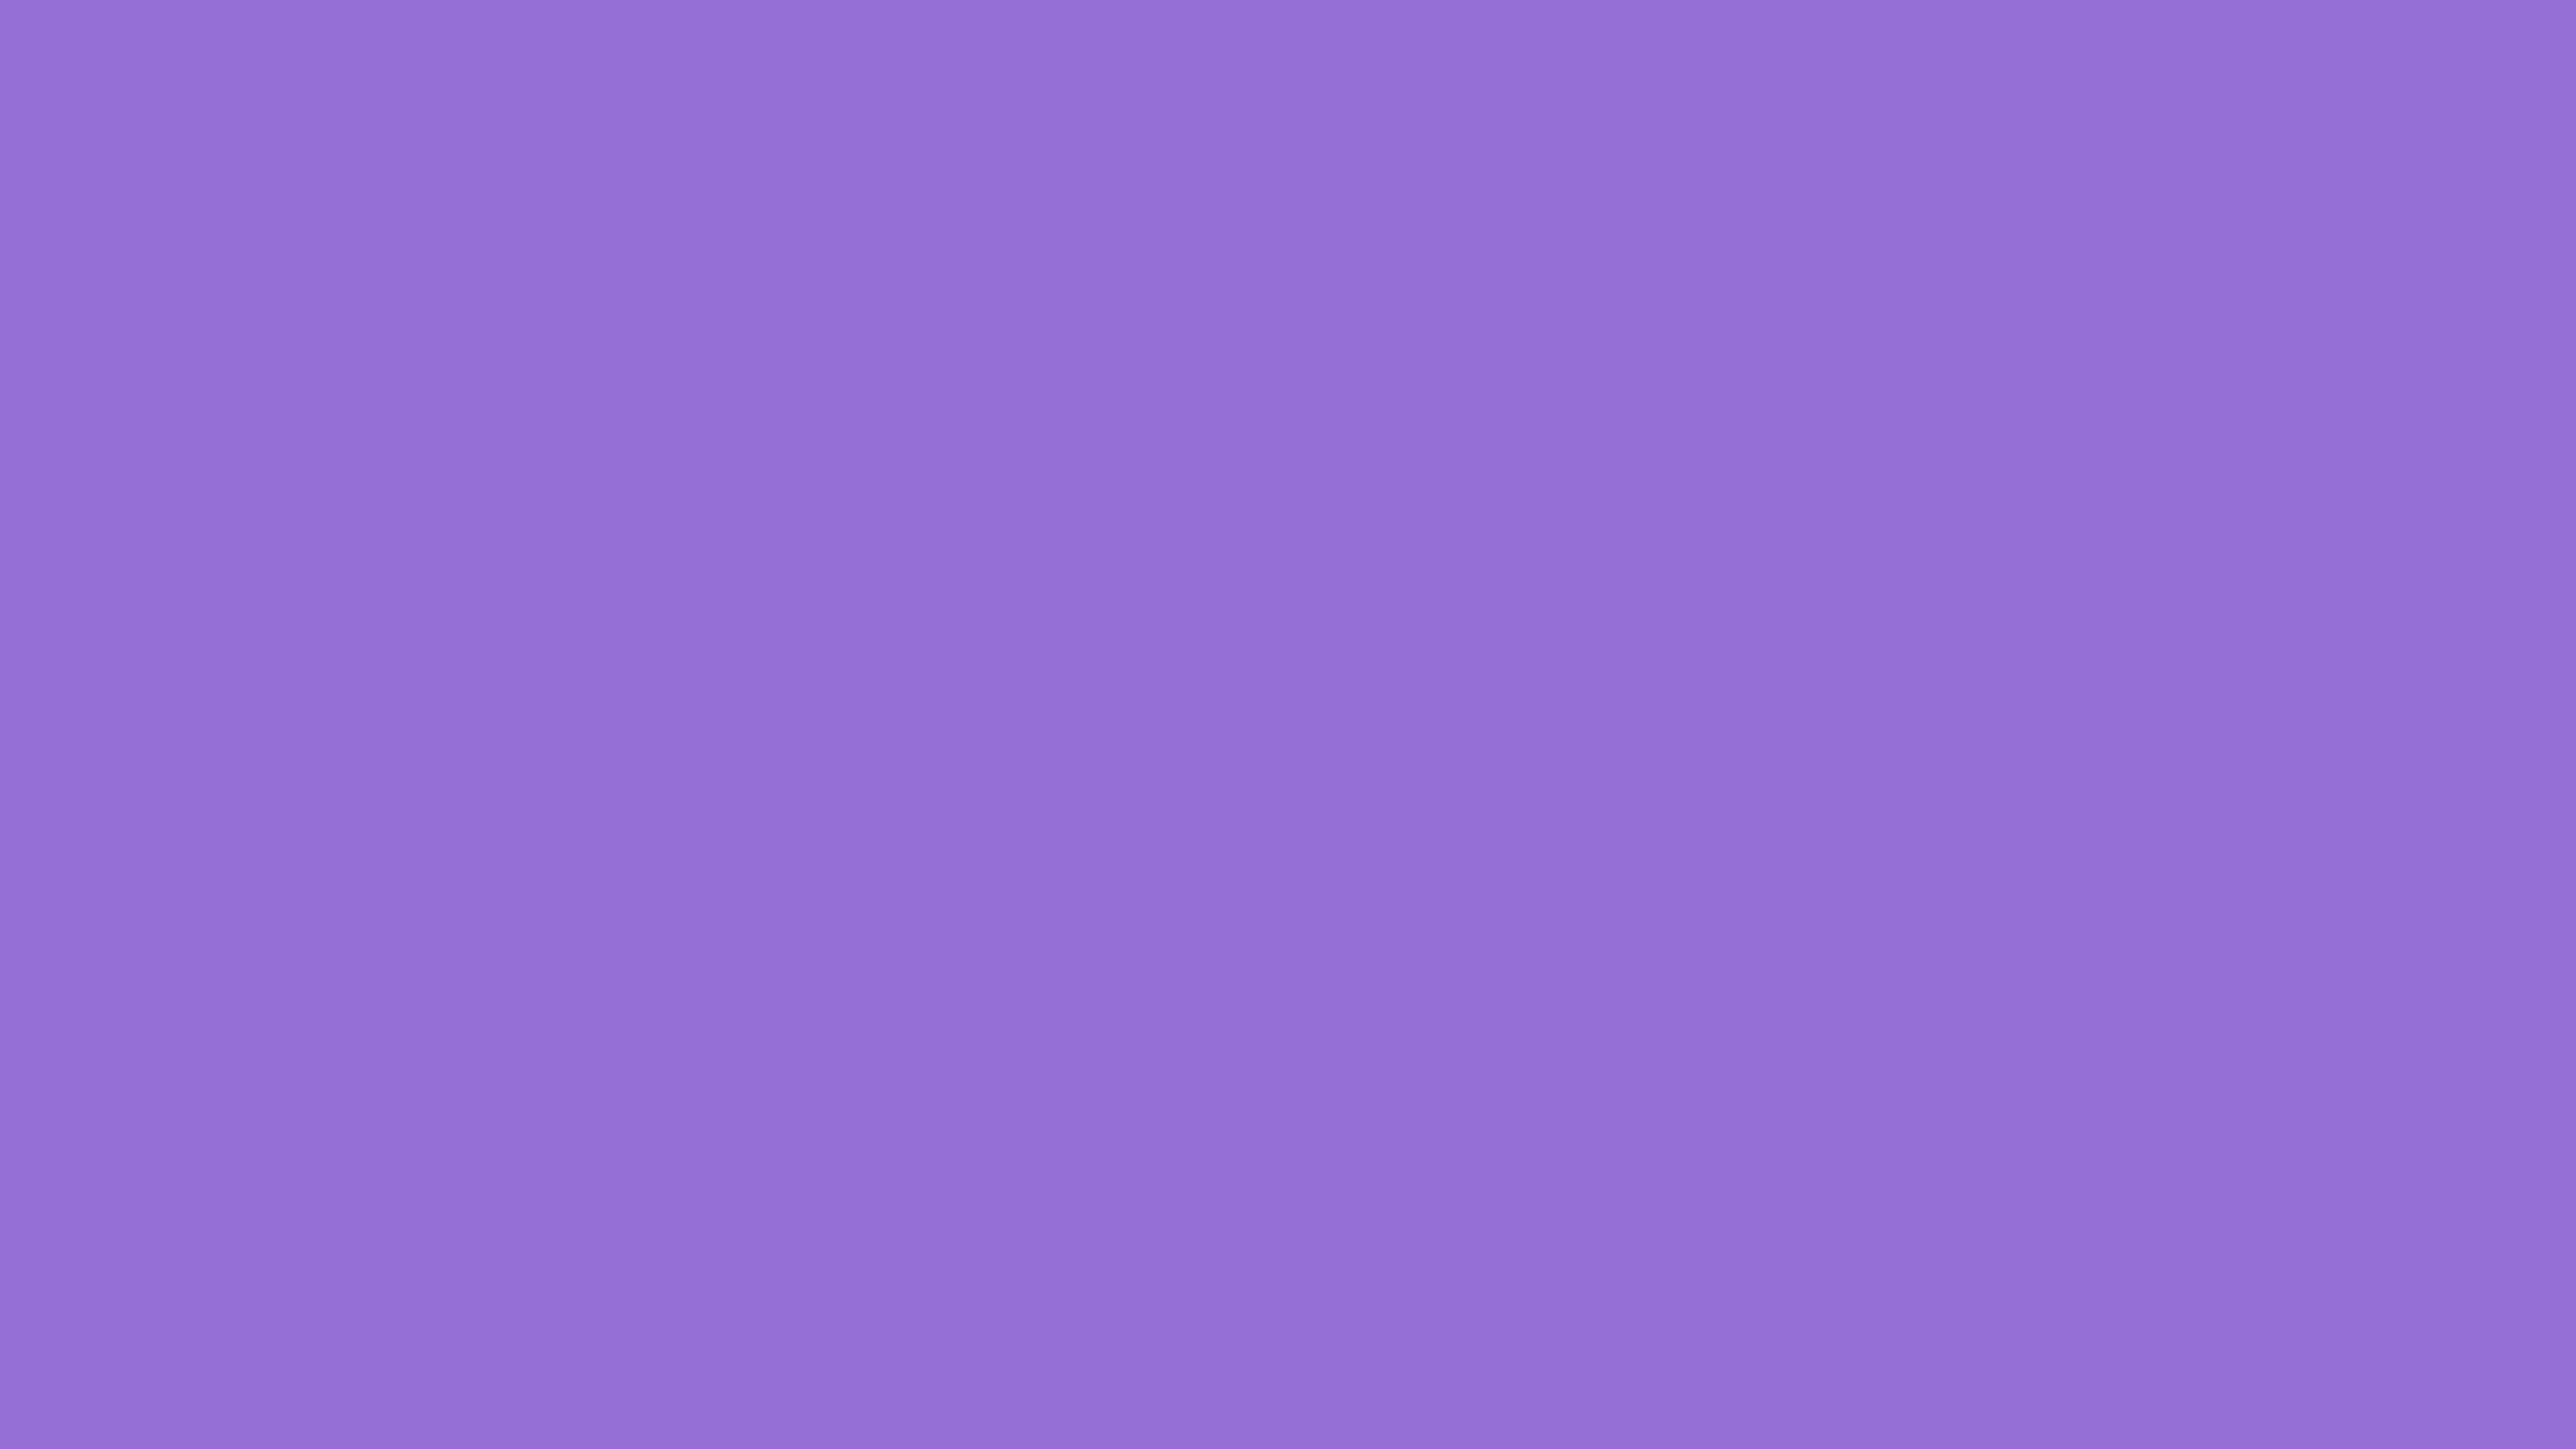 3840x2160 Dark Pastel Purple Solid Color Background